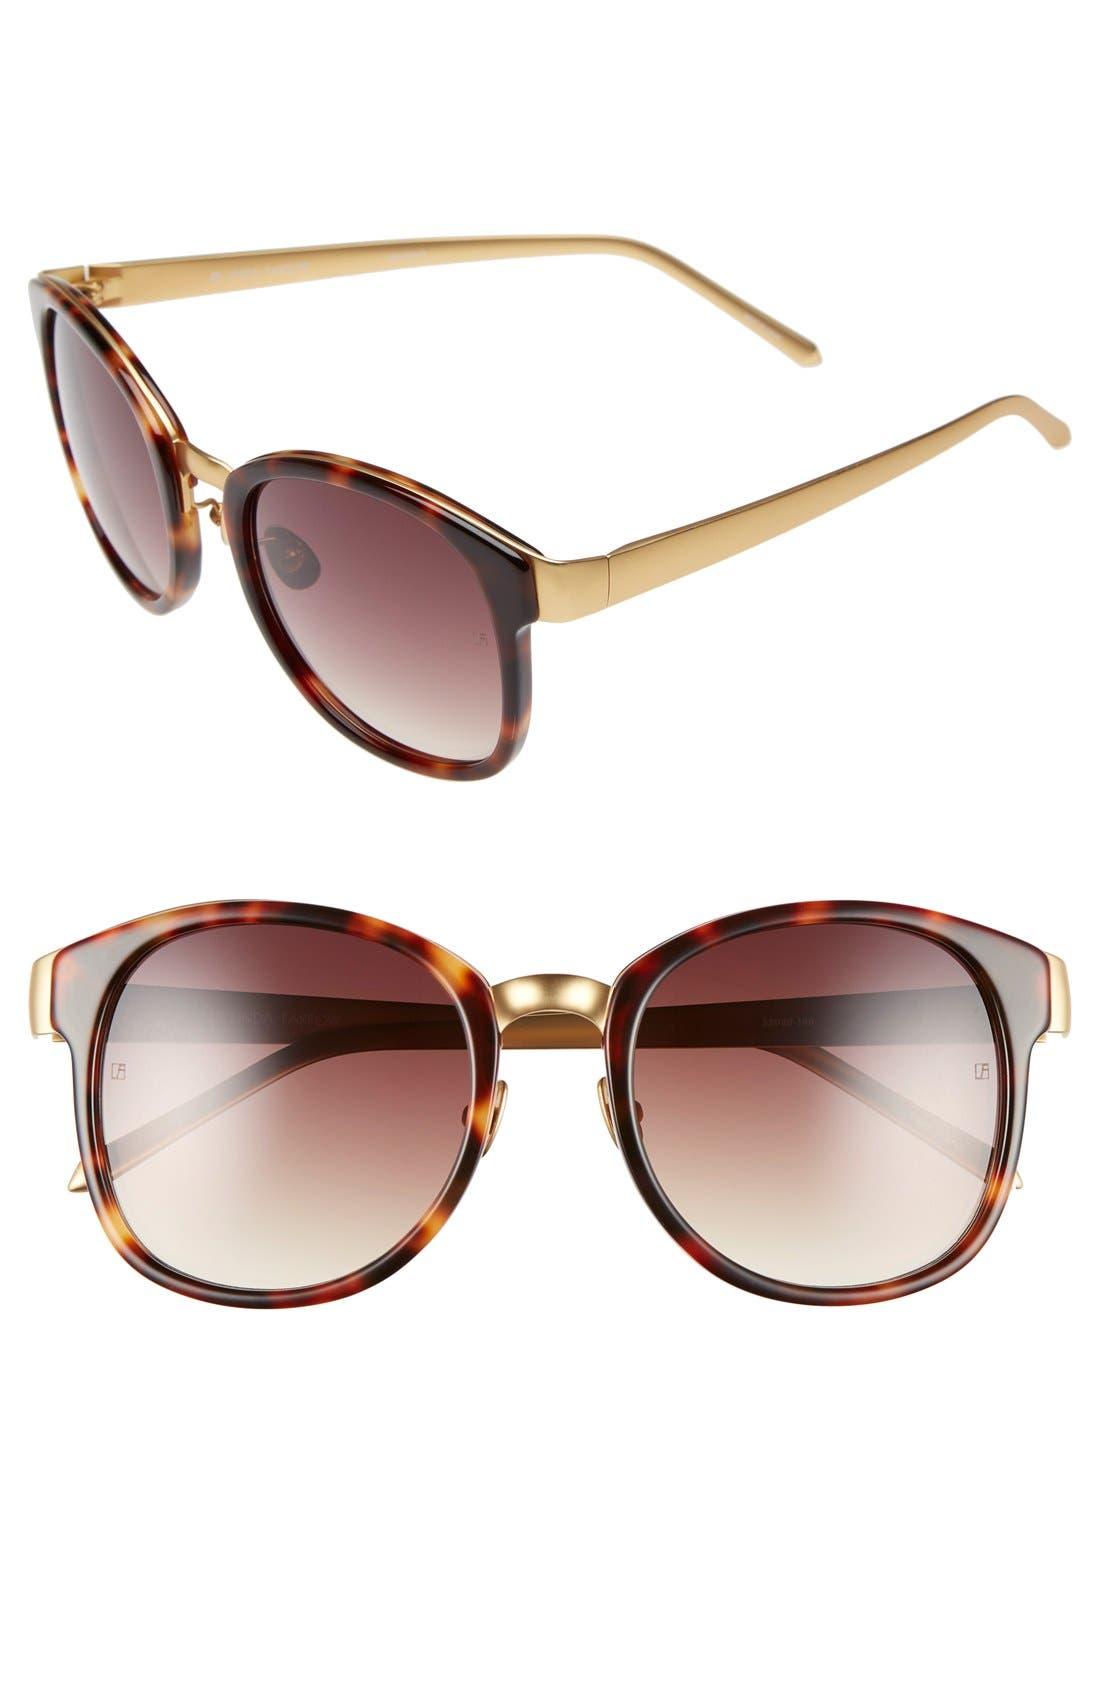 D-Frame 52mm 24 Karat Gold Trim Sunglasses,                             Main thumbnail 1, color,                             200